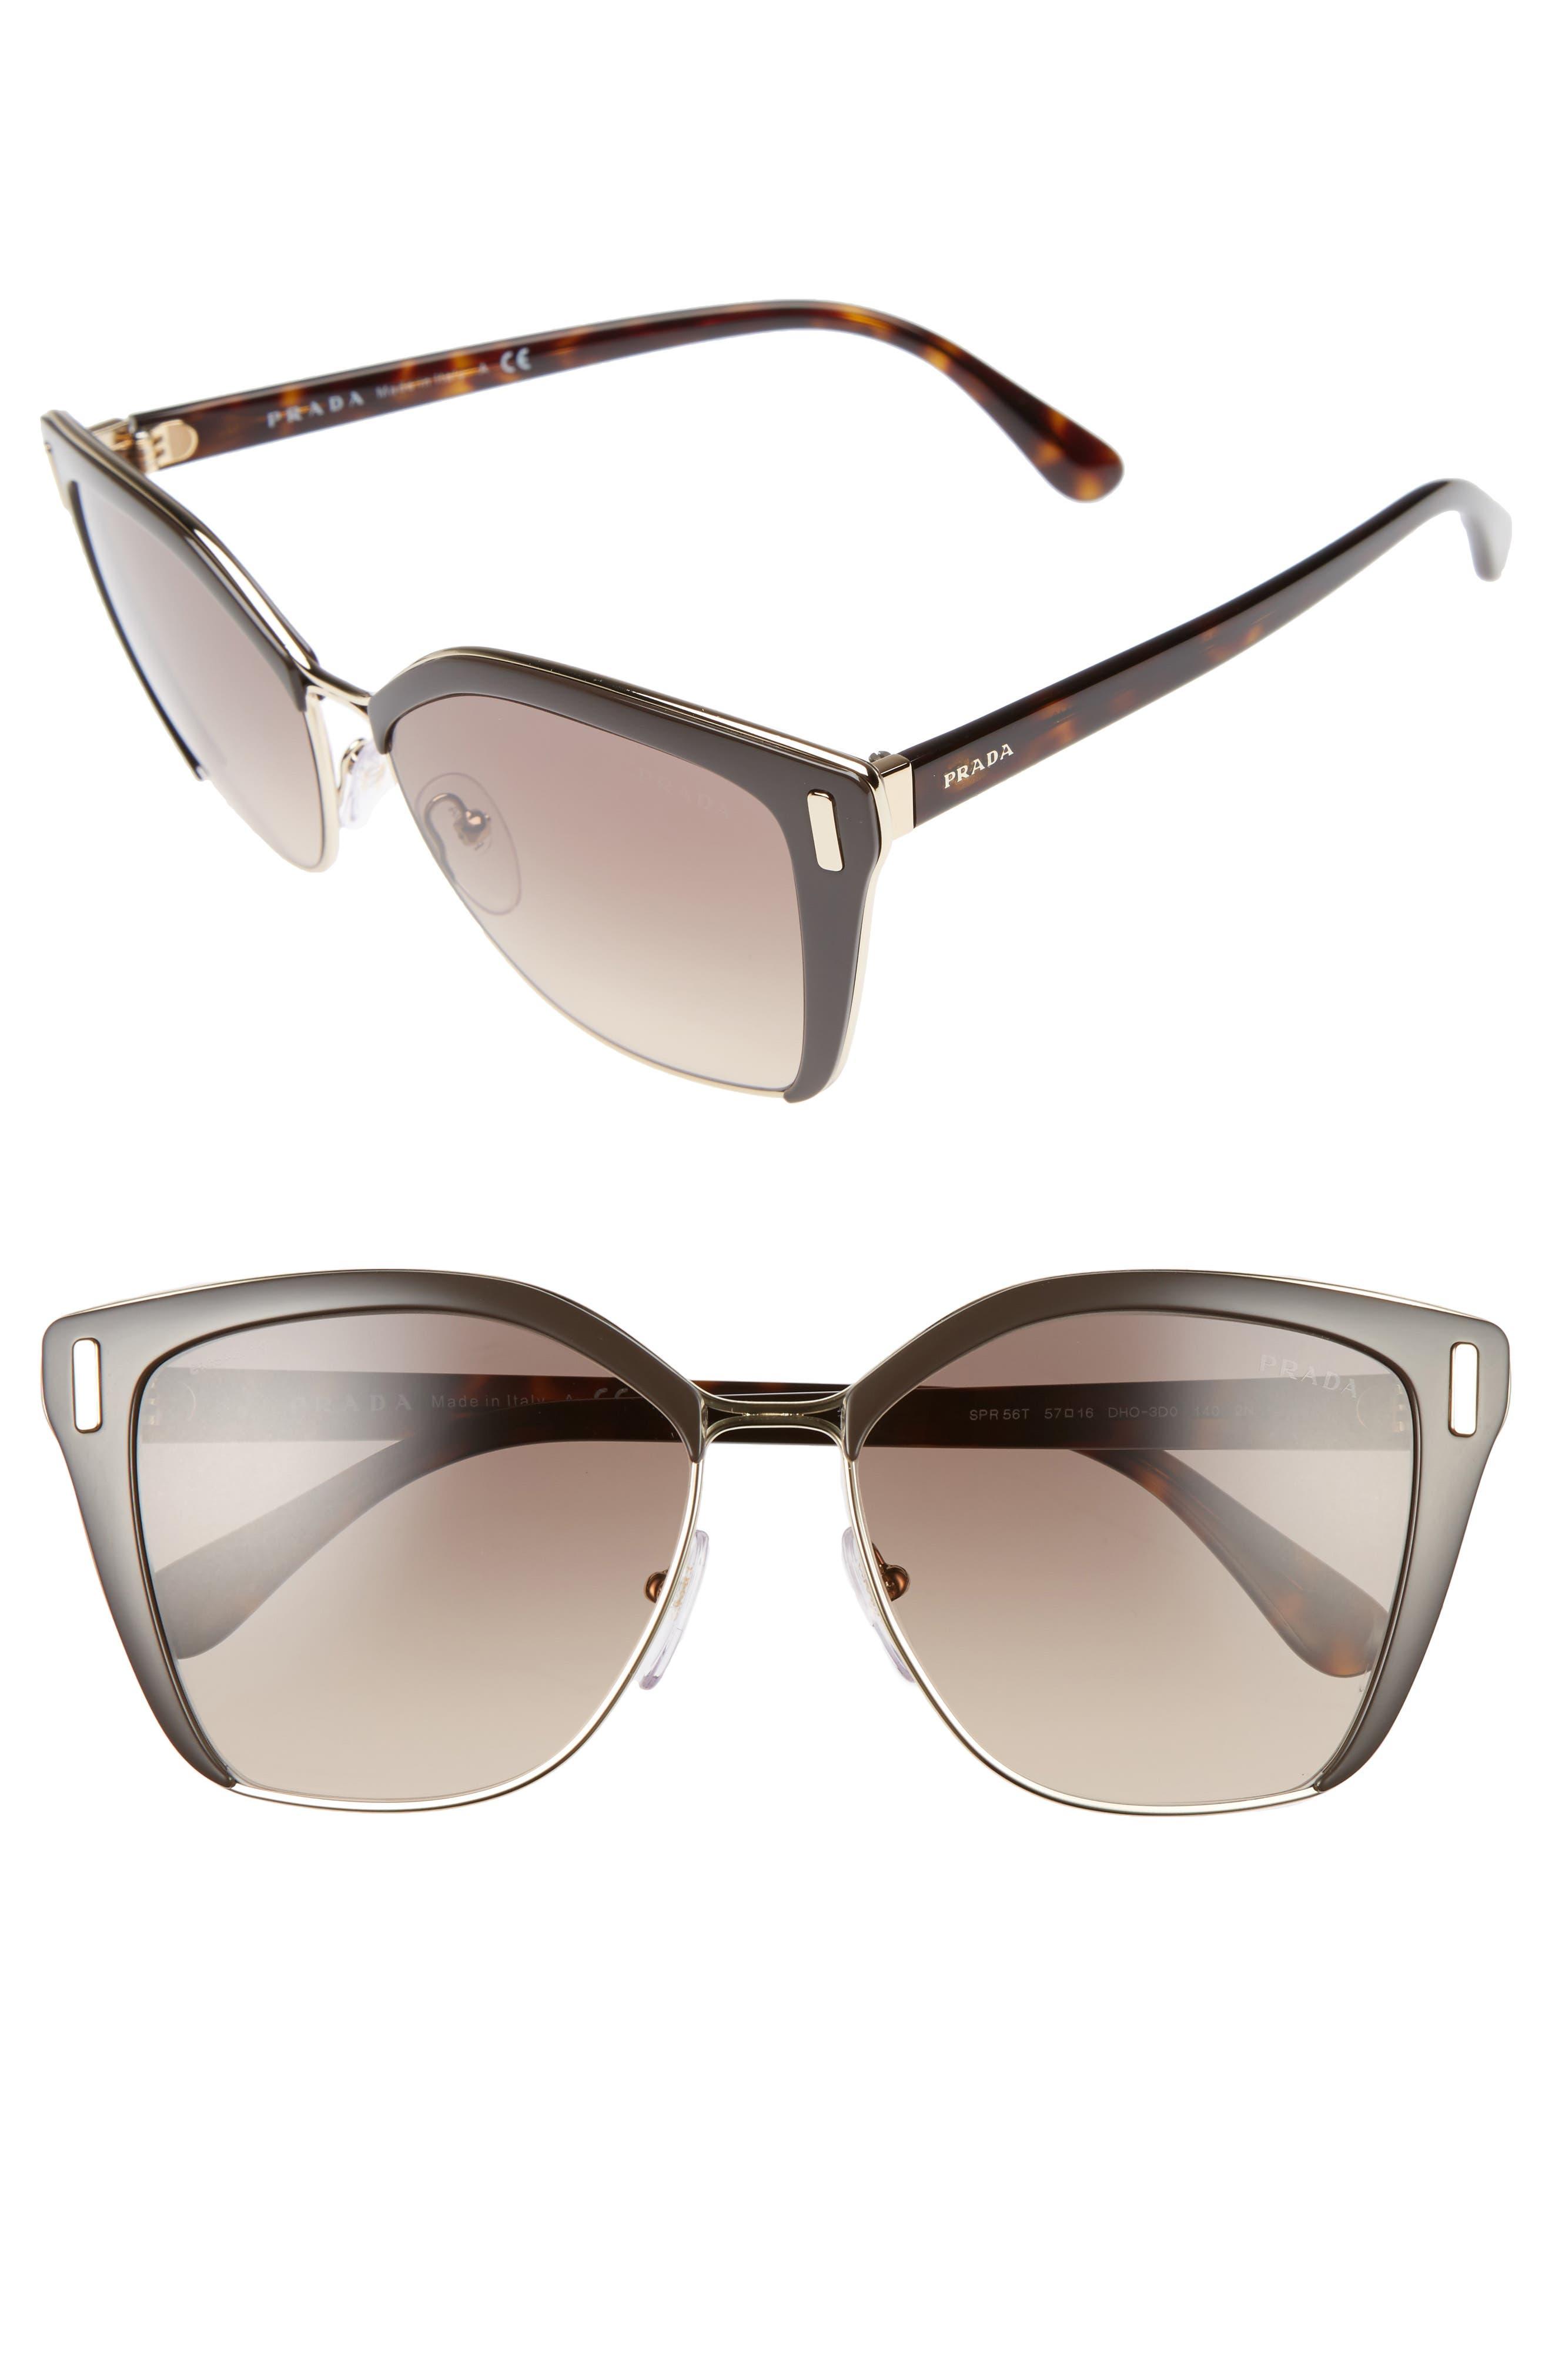 Prada 57mm Gradient Geometric Sunglasses